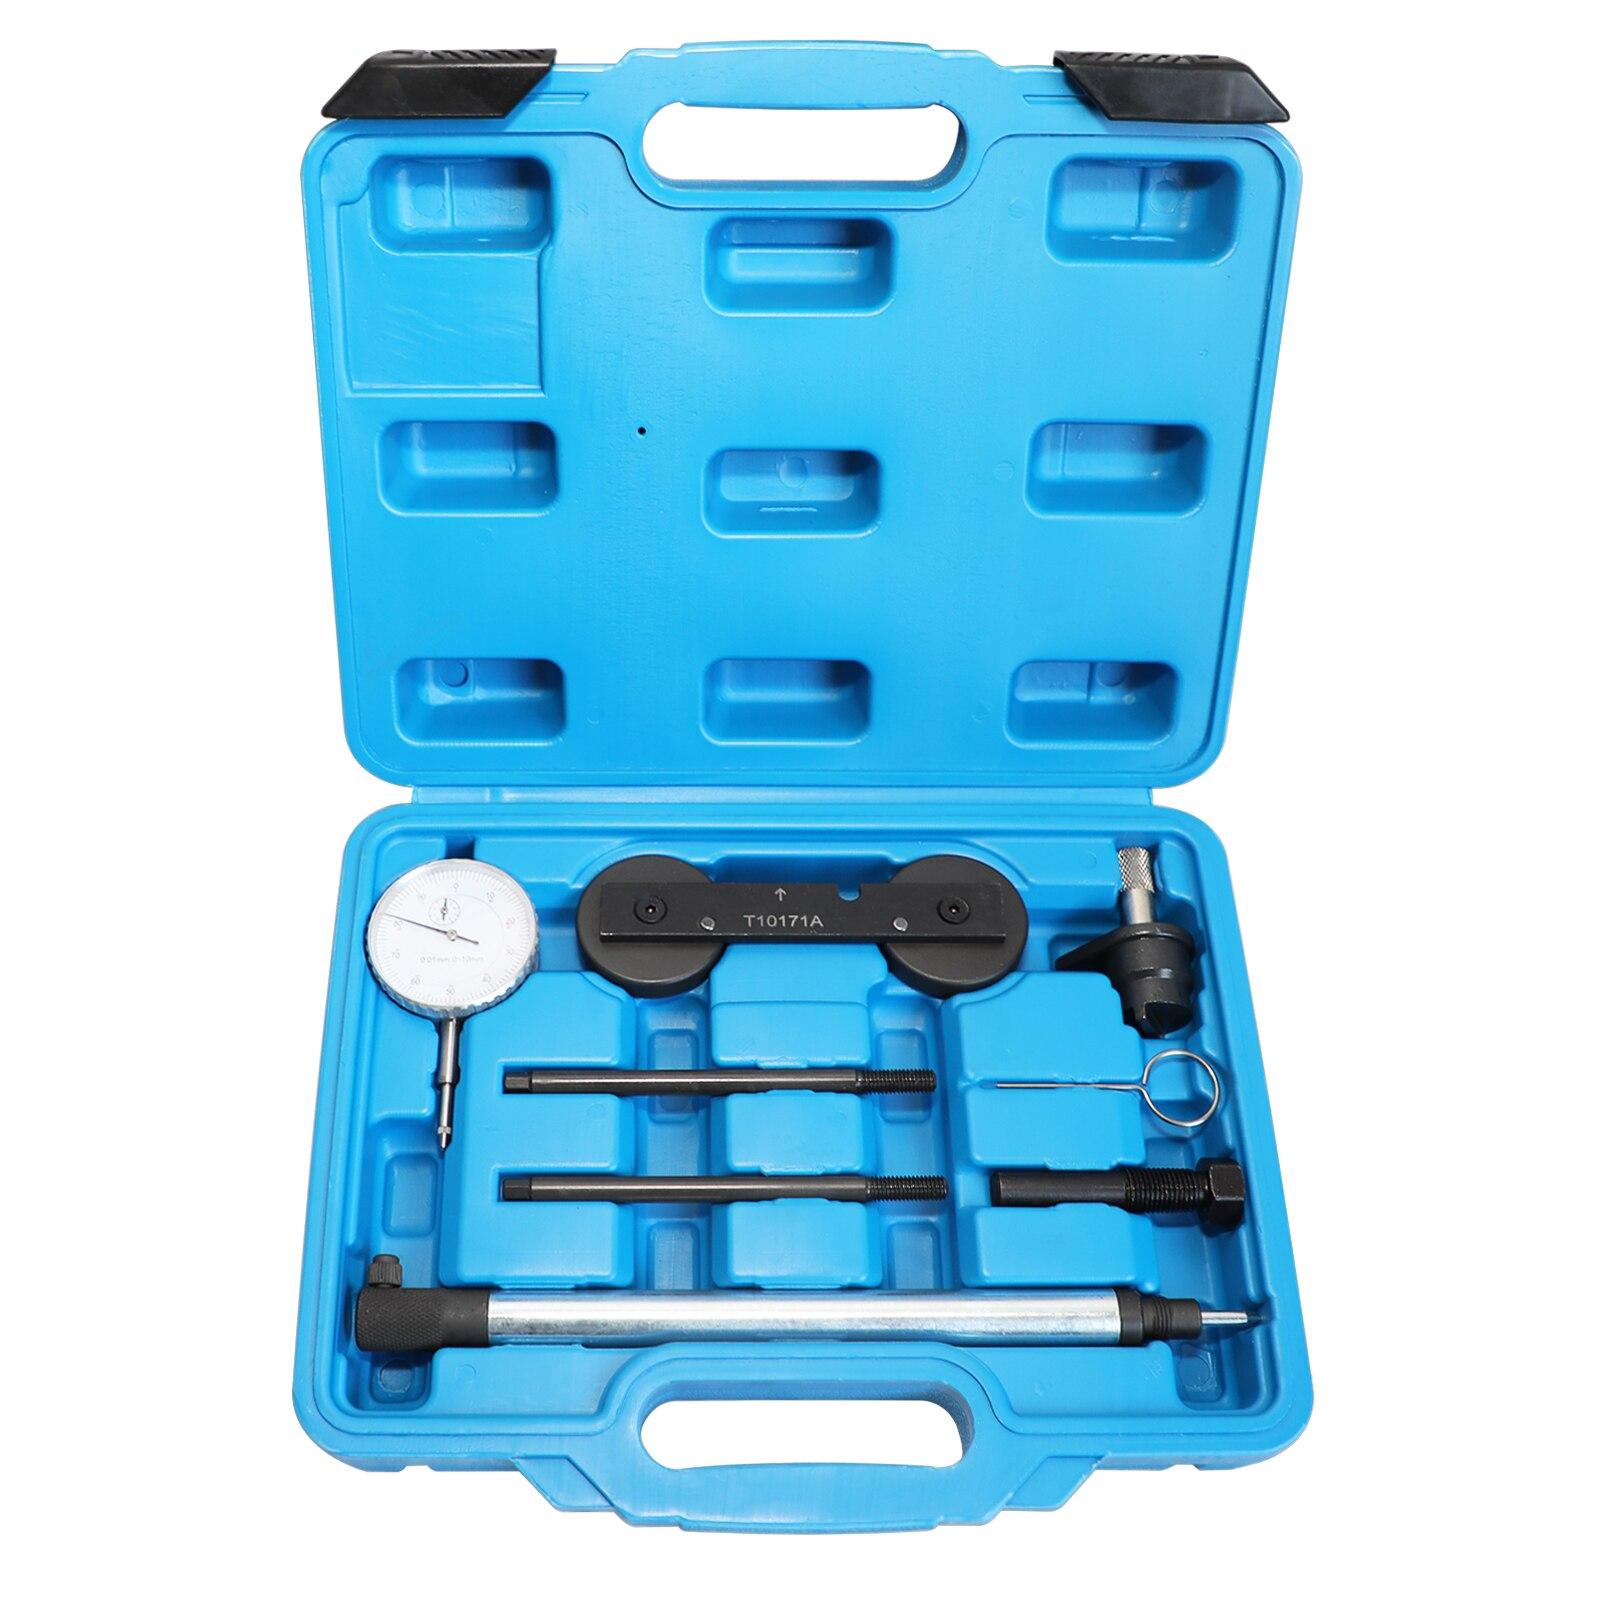 T10171A Engine Timing Tool Kit  For  VW AUDI 1.4/1.6FSi 1.4 TSi 1.2TFSi/FSi Inc Dial Gauge Tdc & Locking Tools For  VW AUDI 1.4